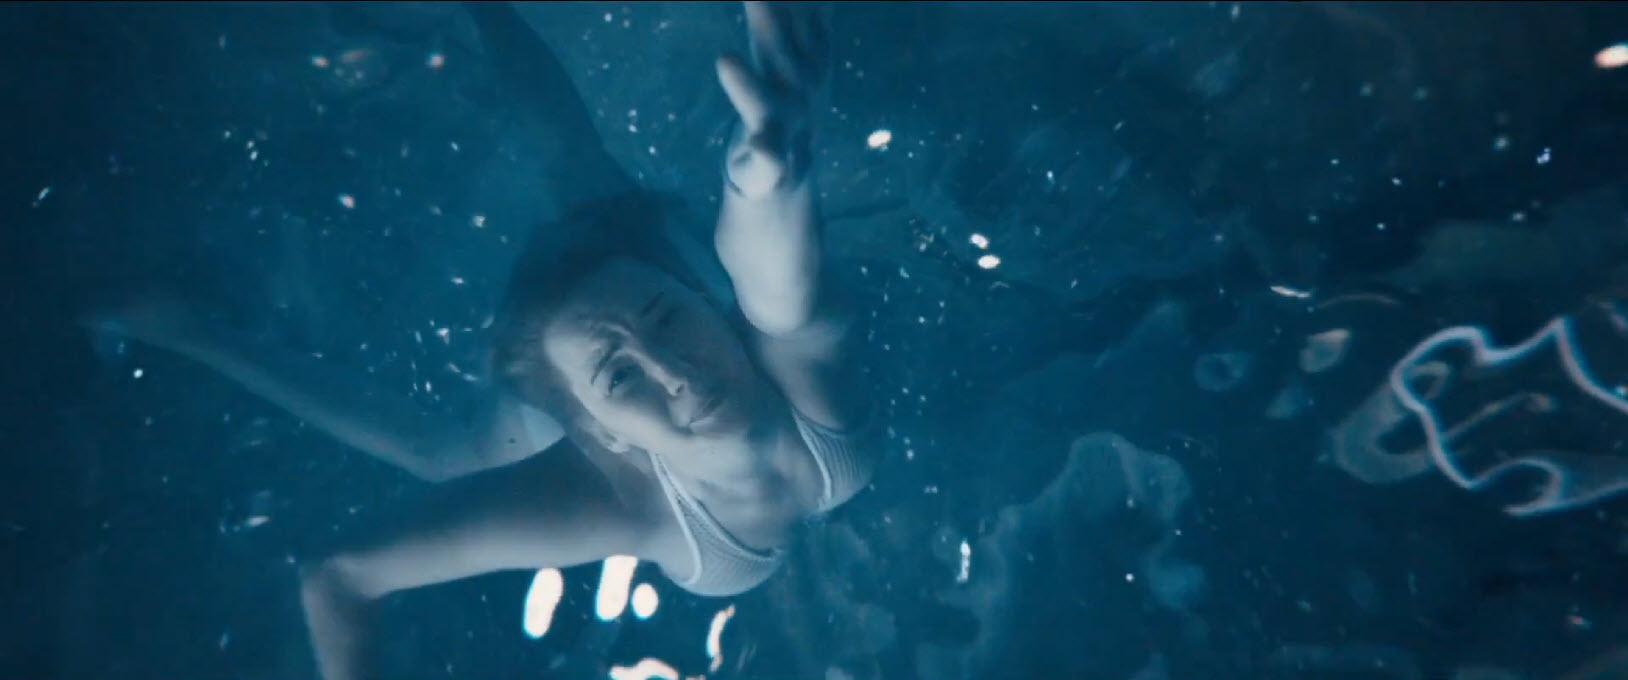 'Passengers' trailer lands along with new Chris Pratt, Jennifer Lawrence images 2016 images